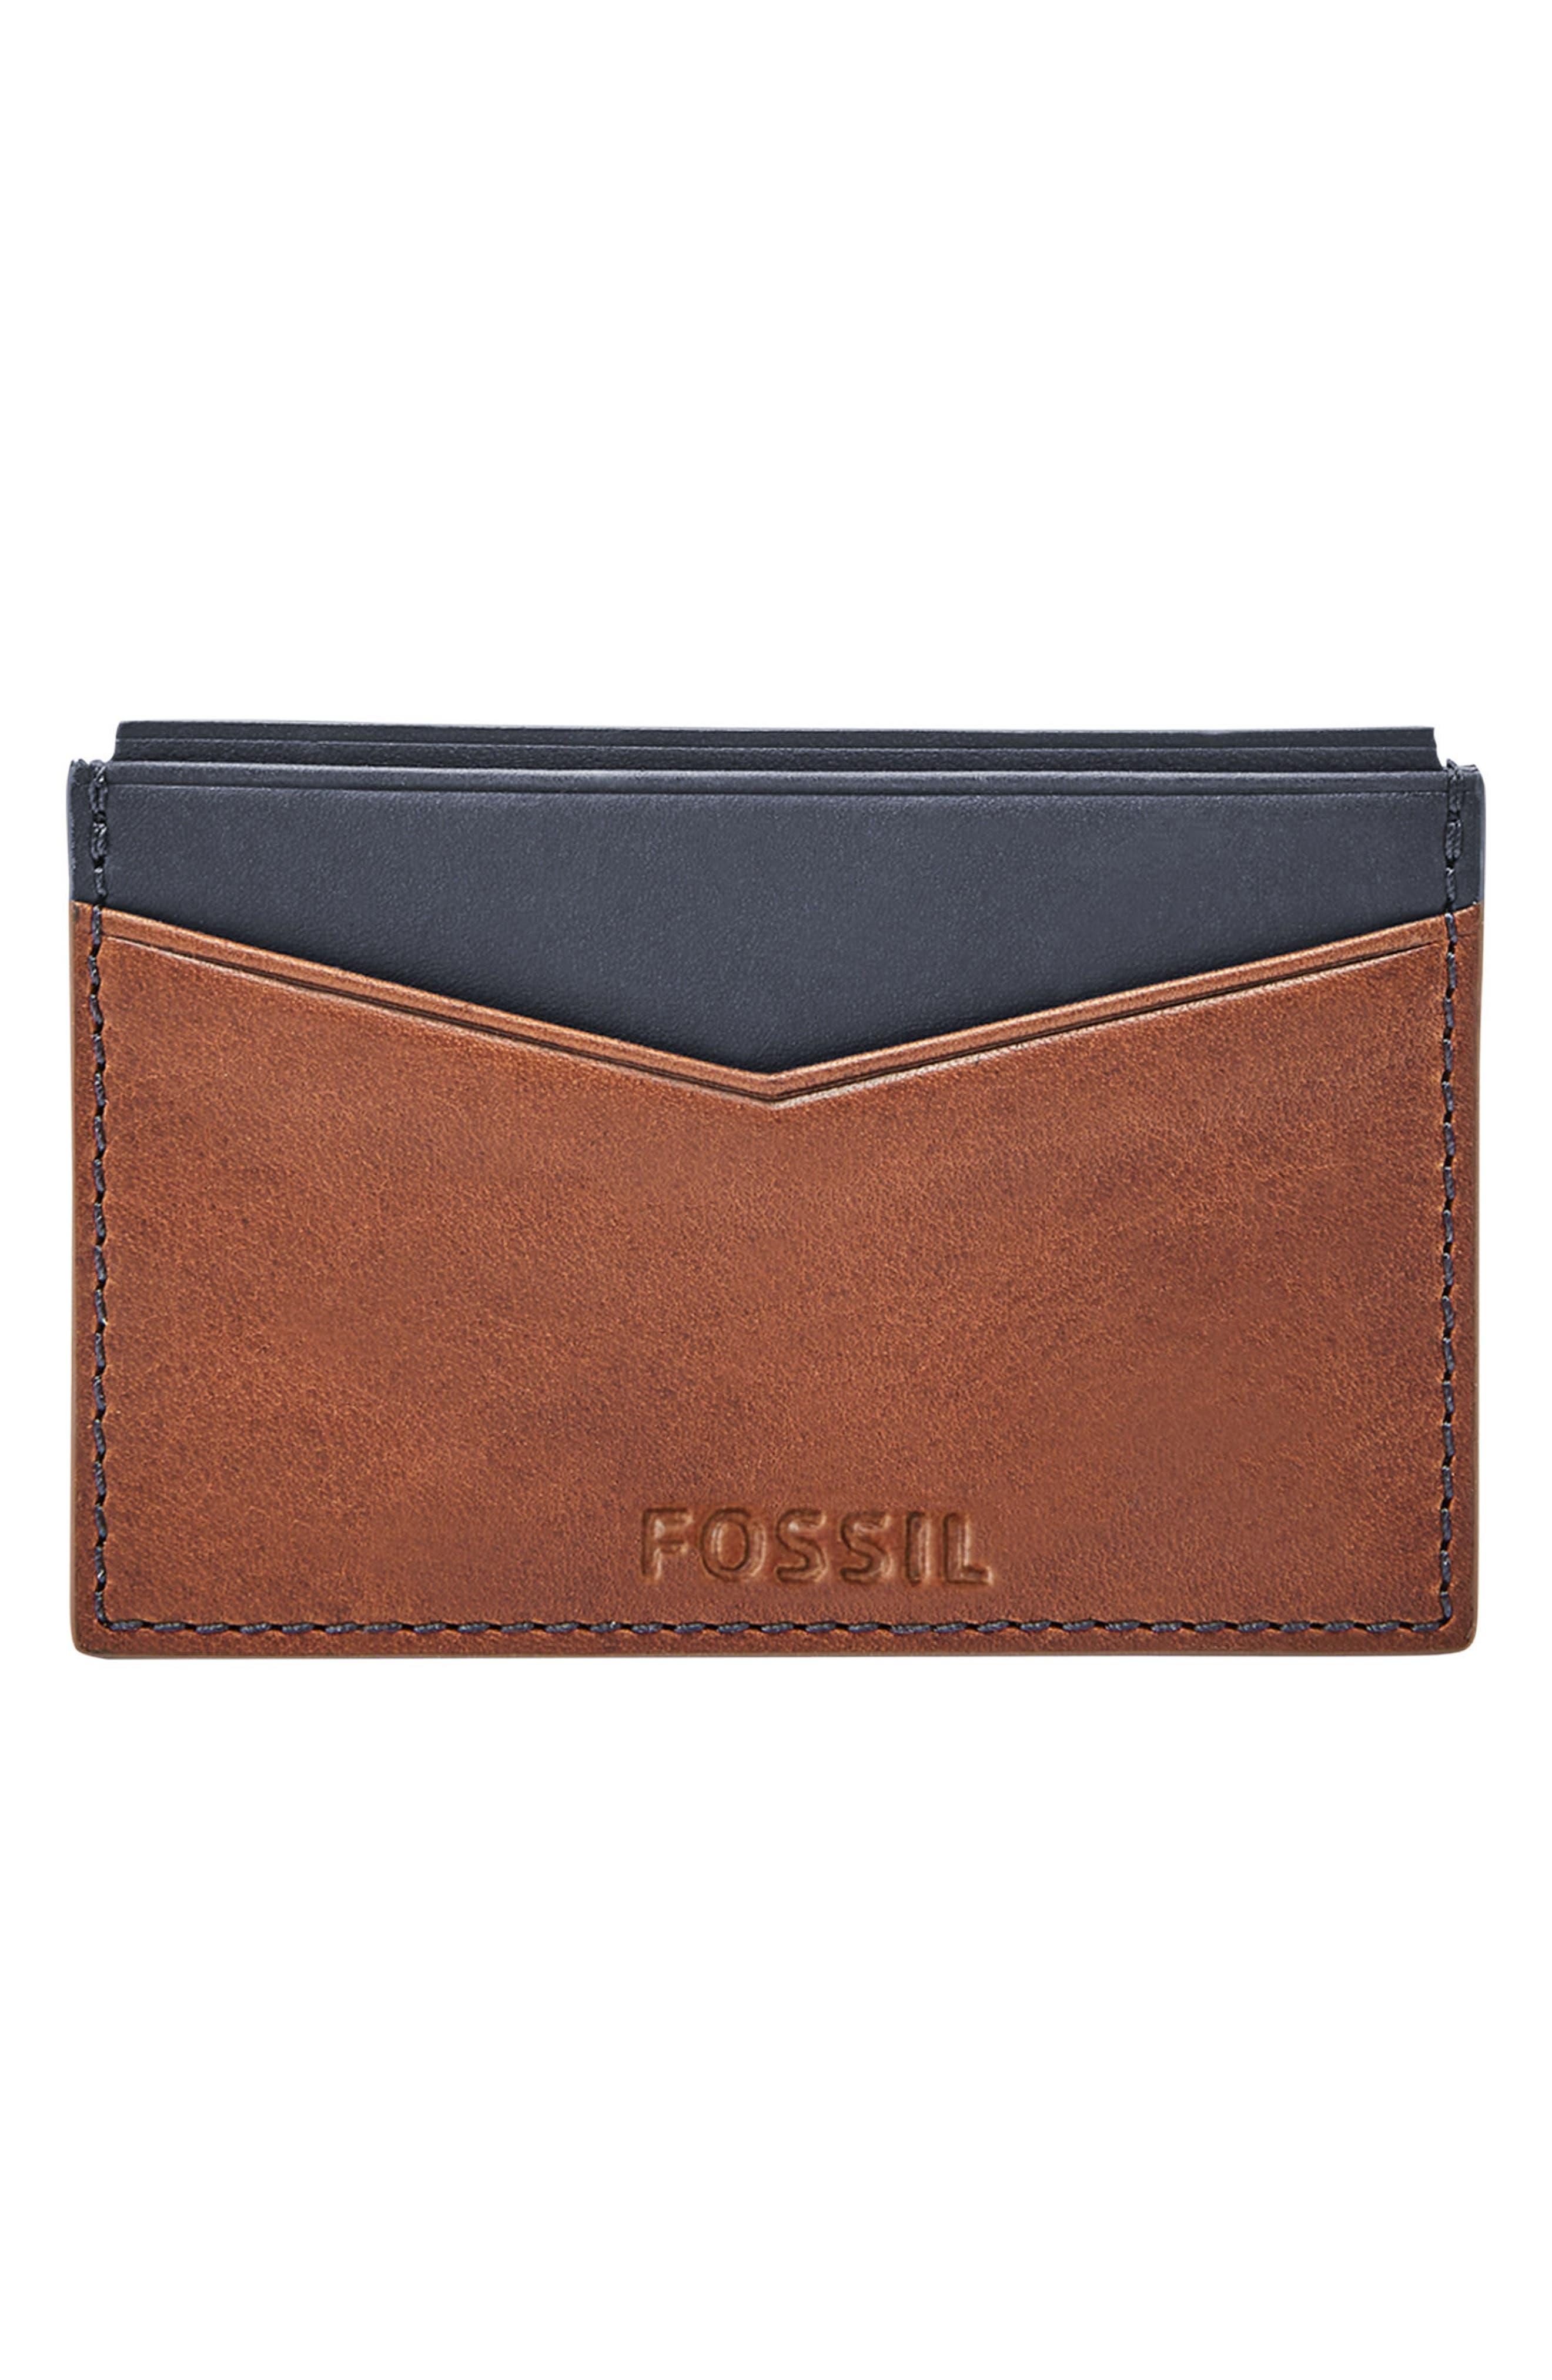 Townsman Chronograph Leather Strap Watch & Wallet Set, 44mm,                             Alternate thumbnail 2, color,                             Brown/ Blue/ Silver